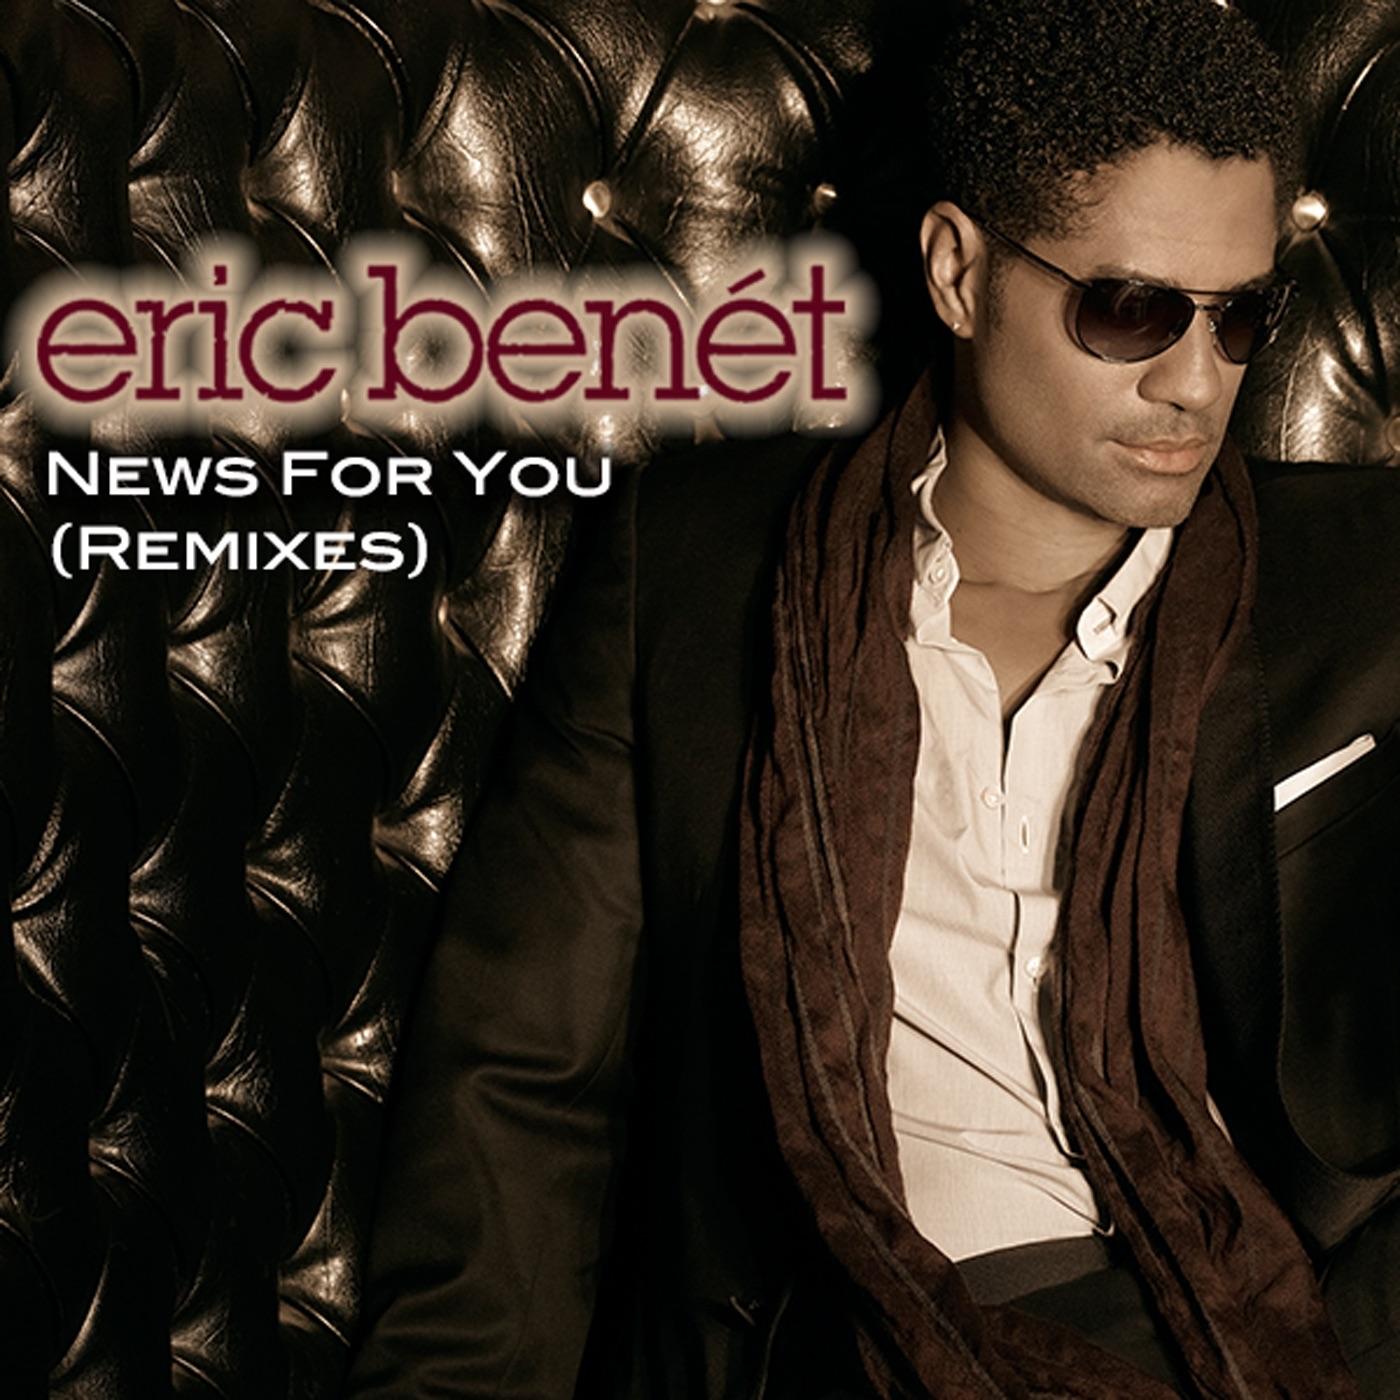 News for You (Remixes) - Single